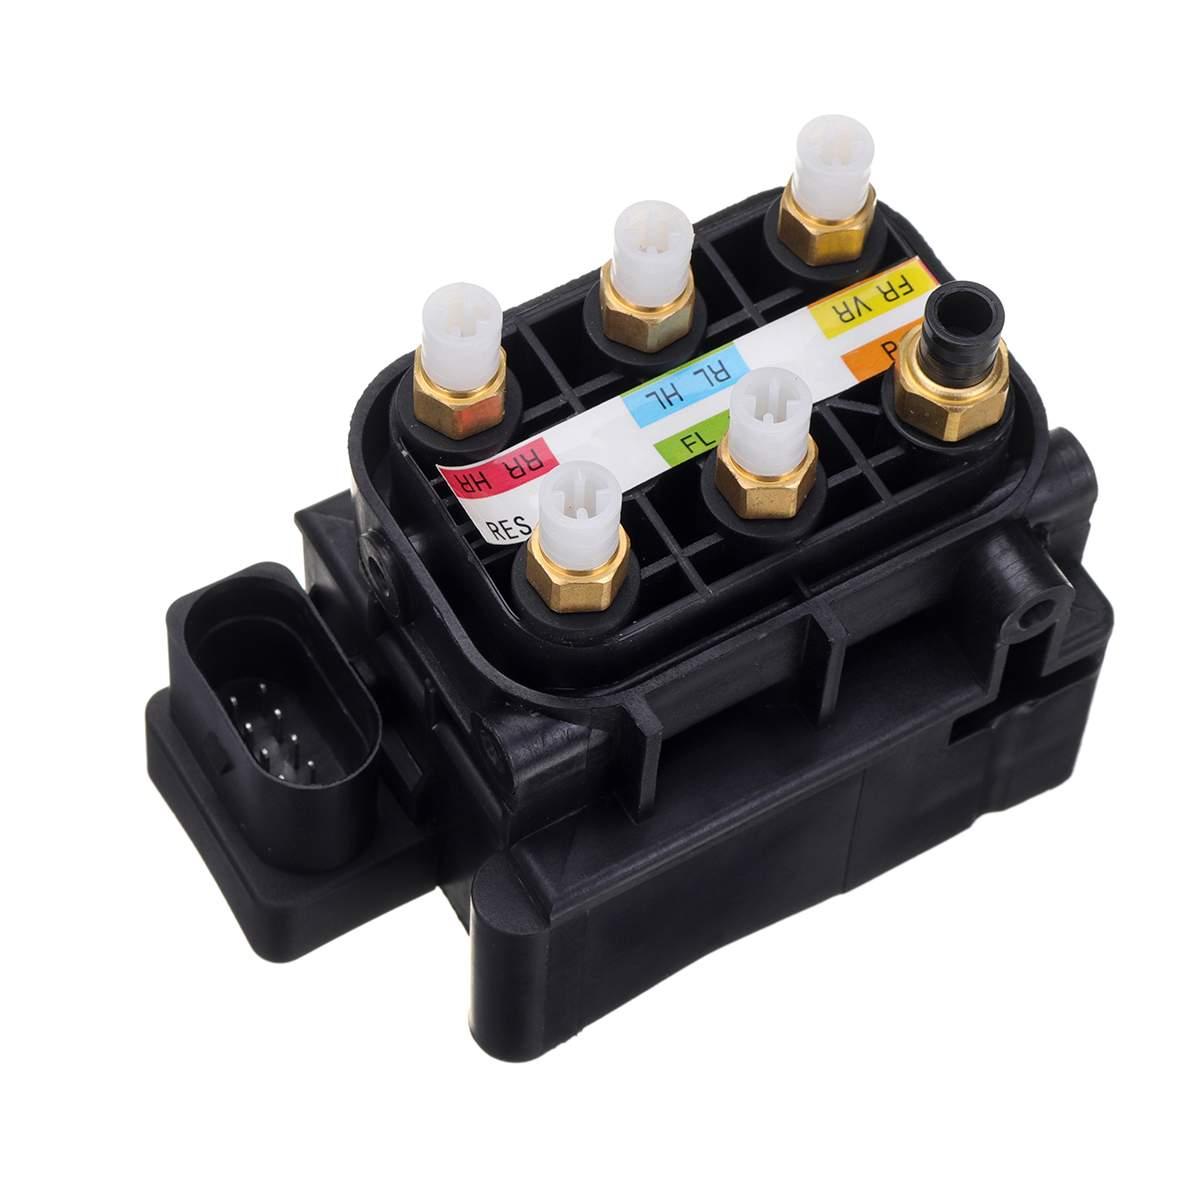 Valve Block Air Pump Suspension Supply A2123200358 1663200204 A251320005 For Mercedes-Benz W221 M-Class W164 GL X164